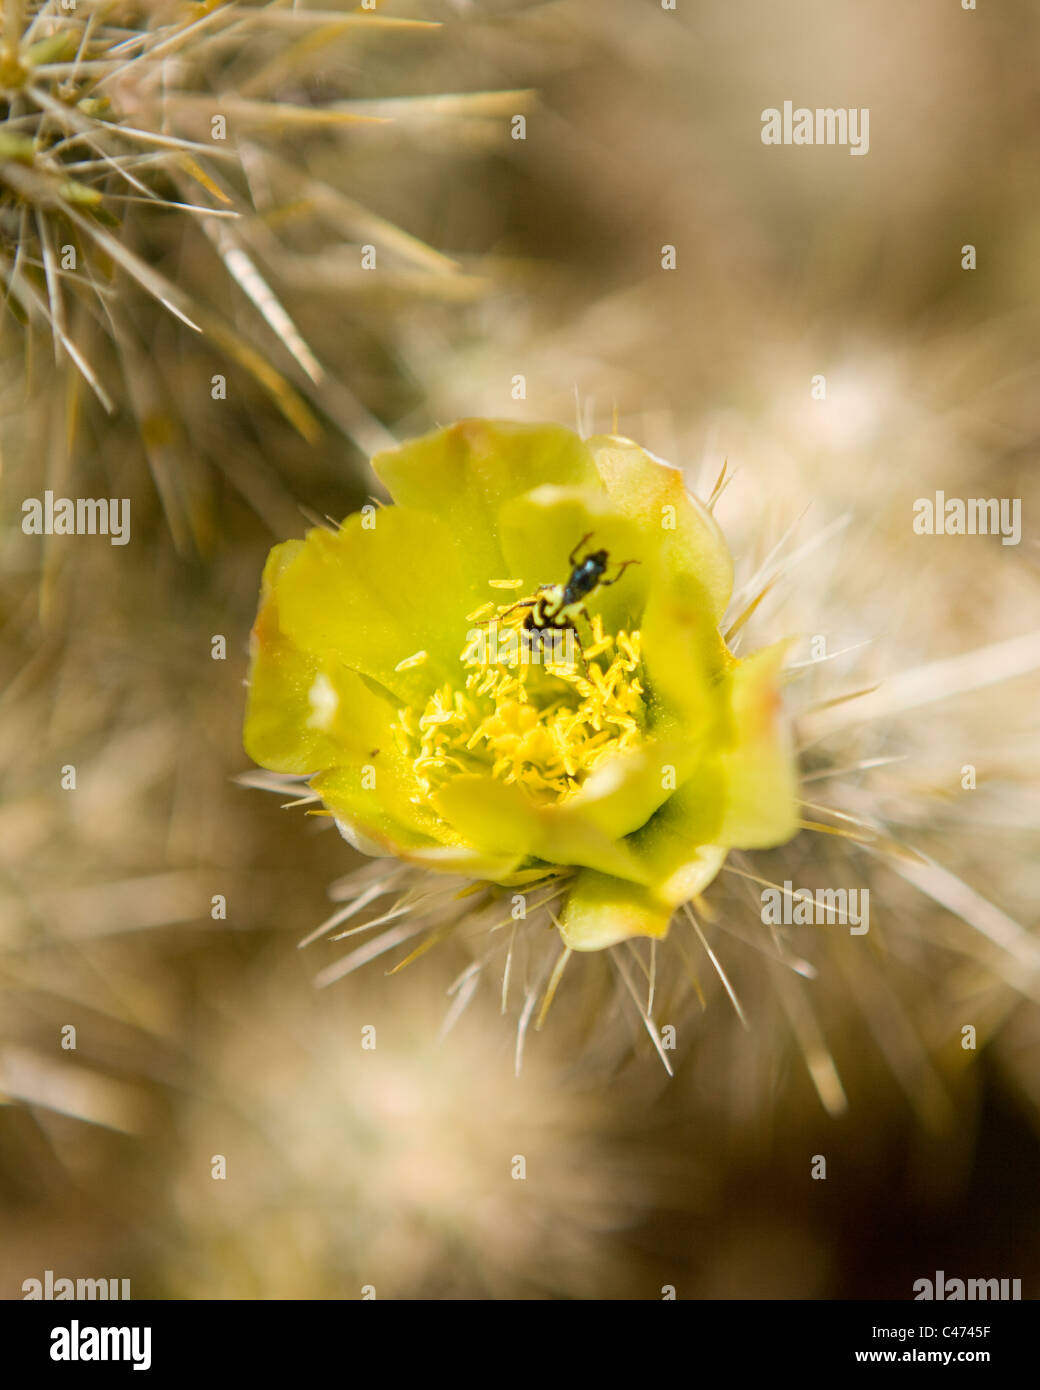 Cholla cactus in bloom - Mojave, California USA Stock Photo